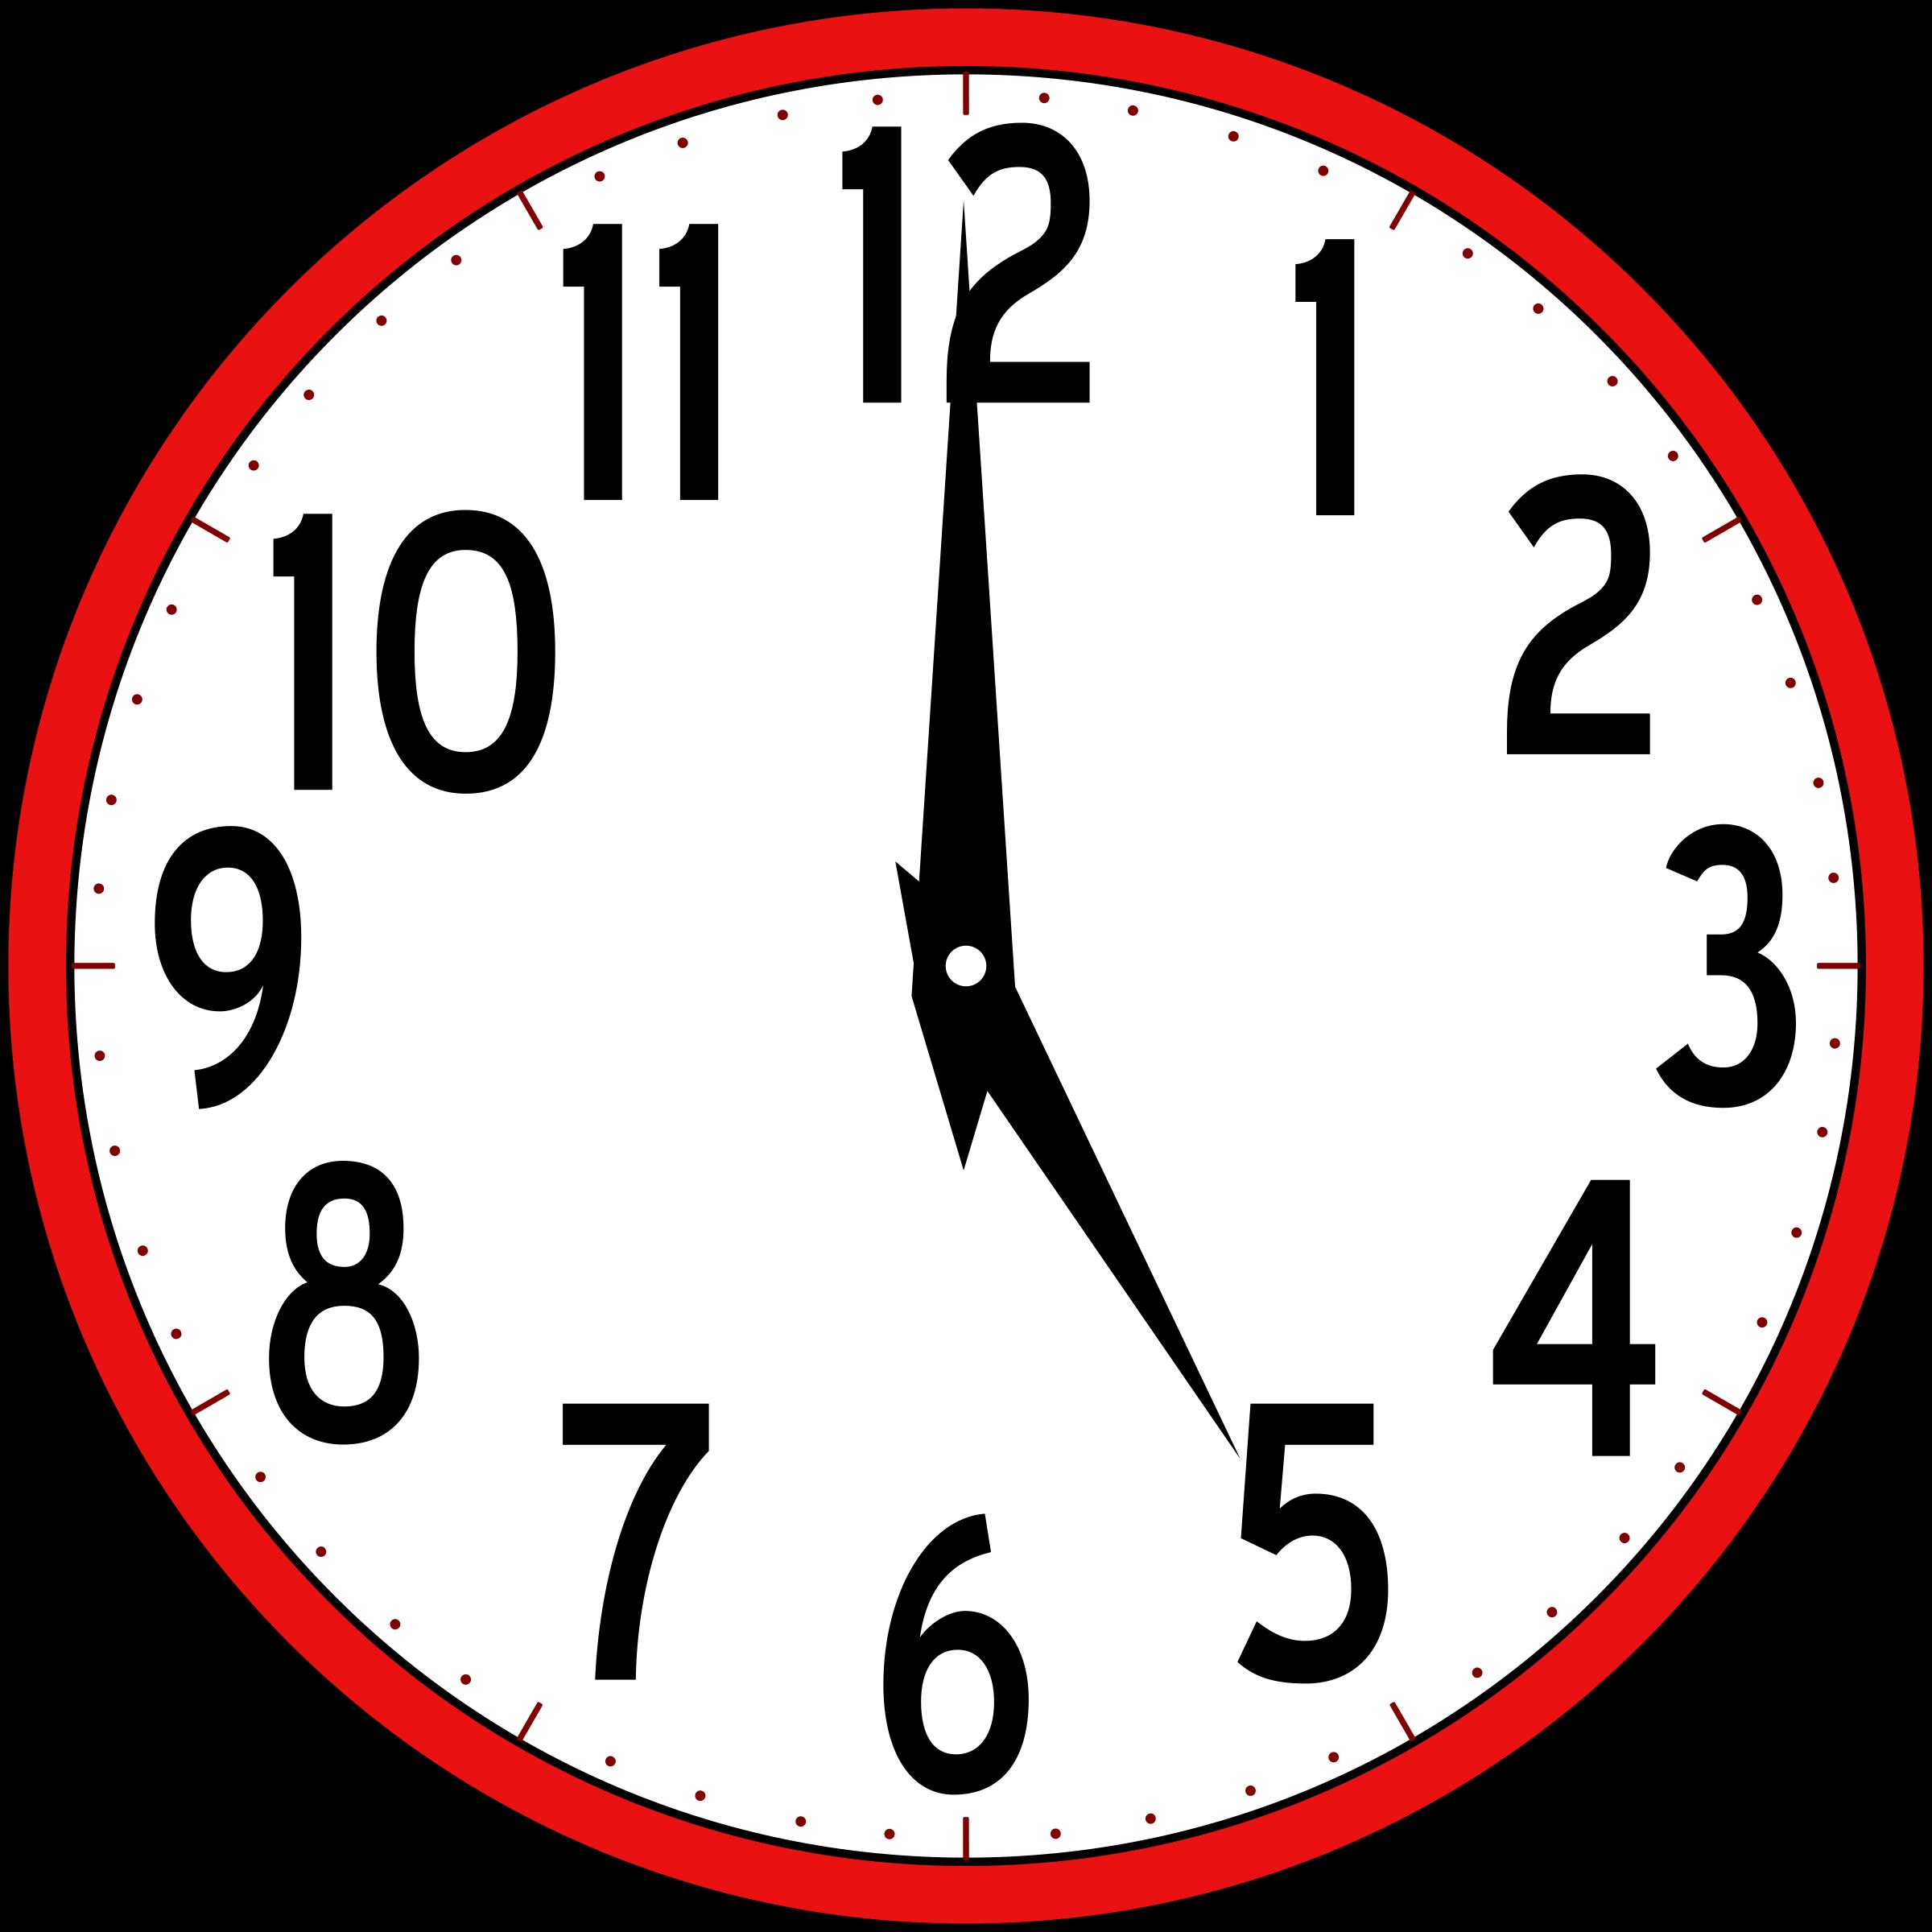 2400x2400 Clock Terrific Clock Image Design Picture Of A Clock Face, Free